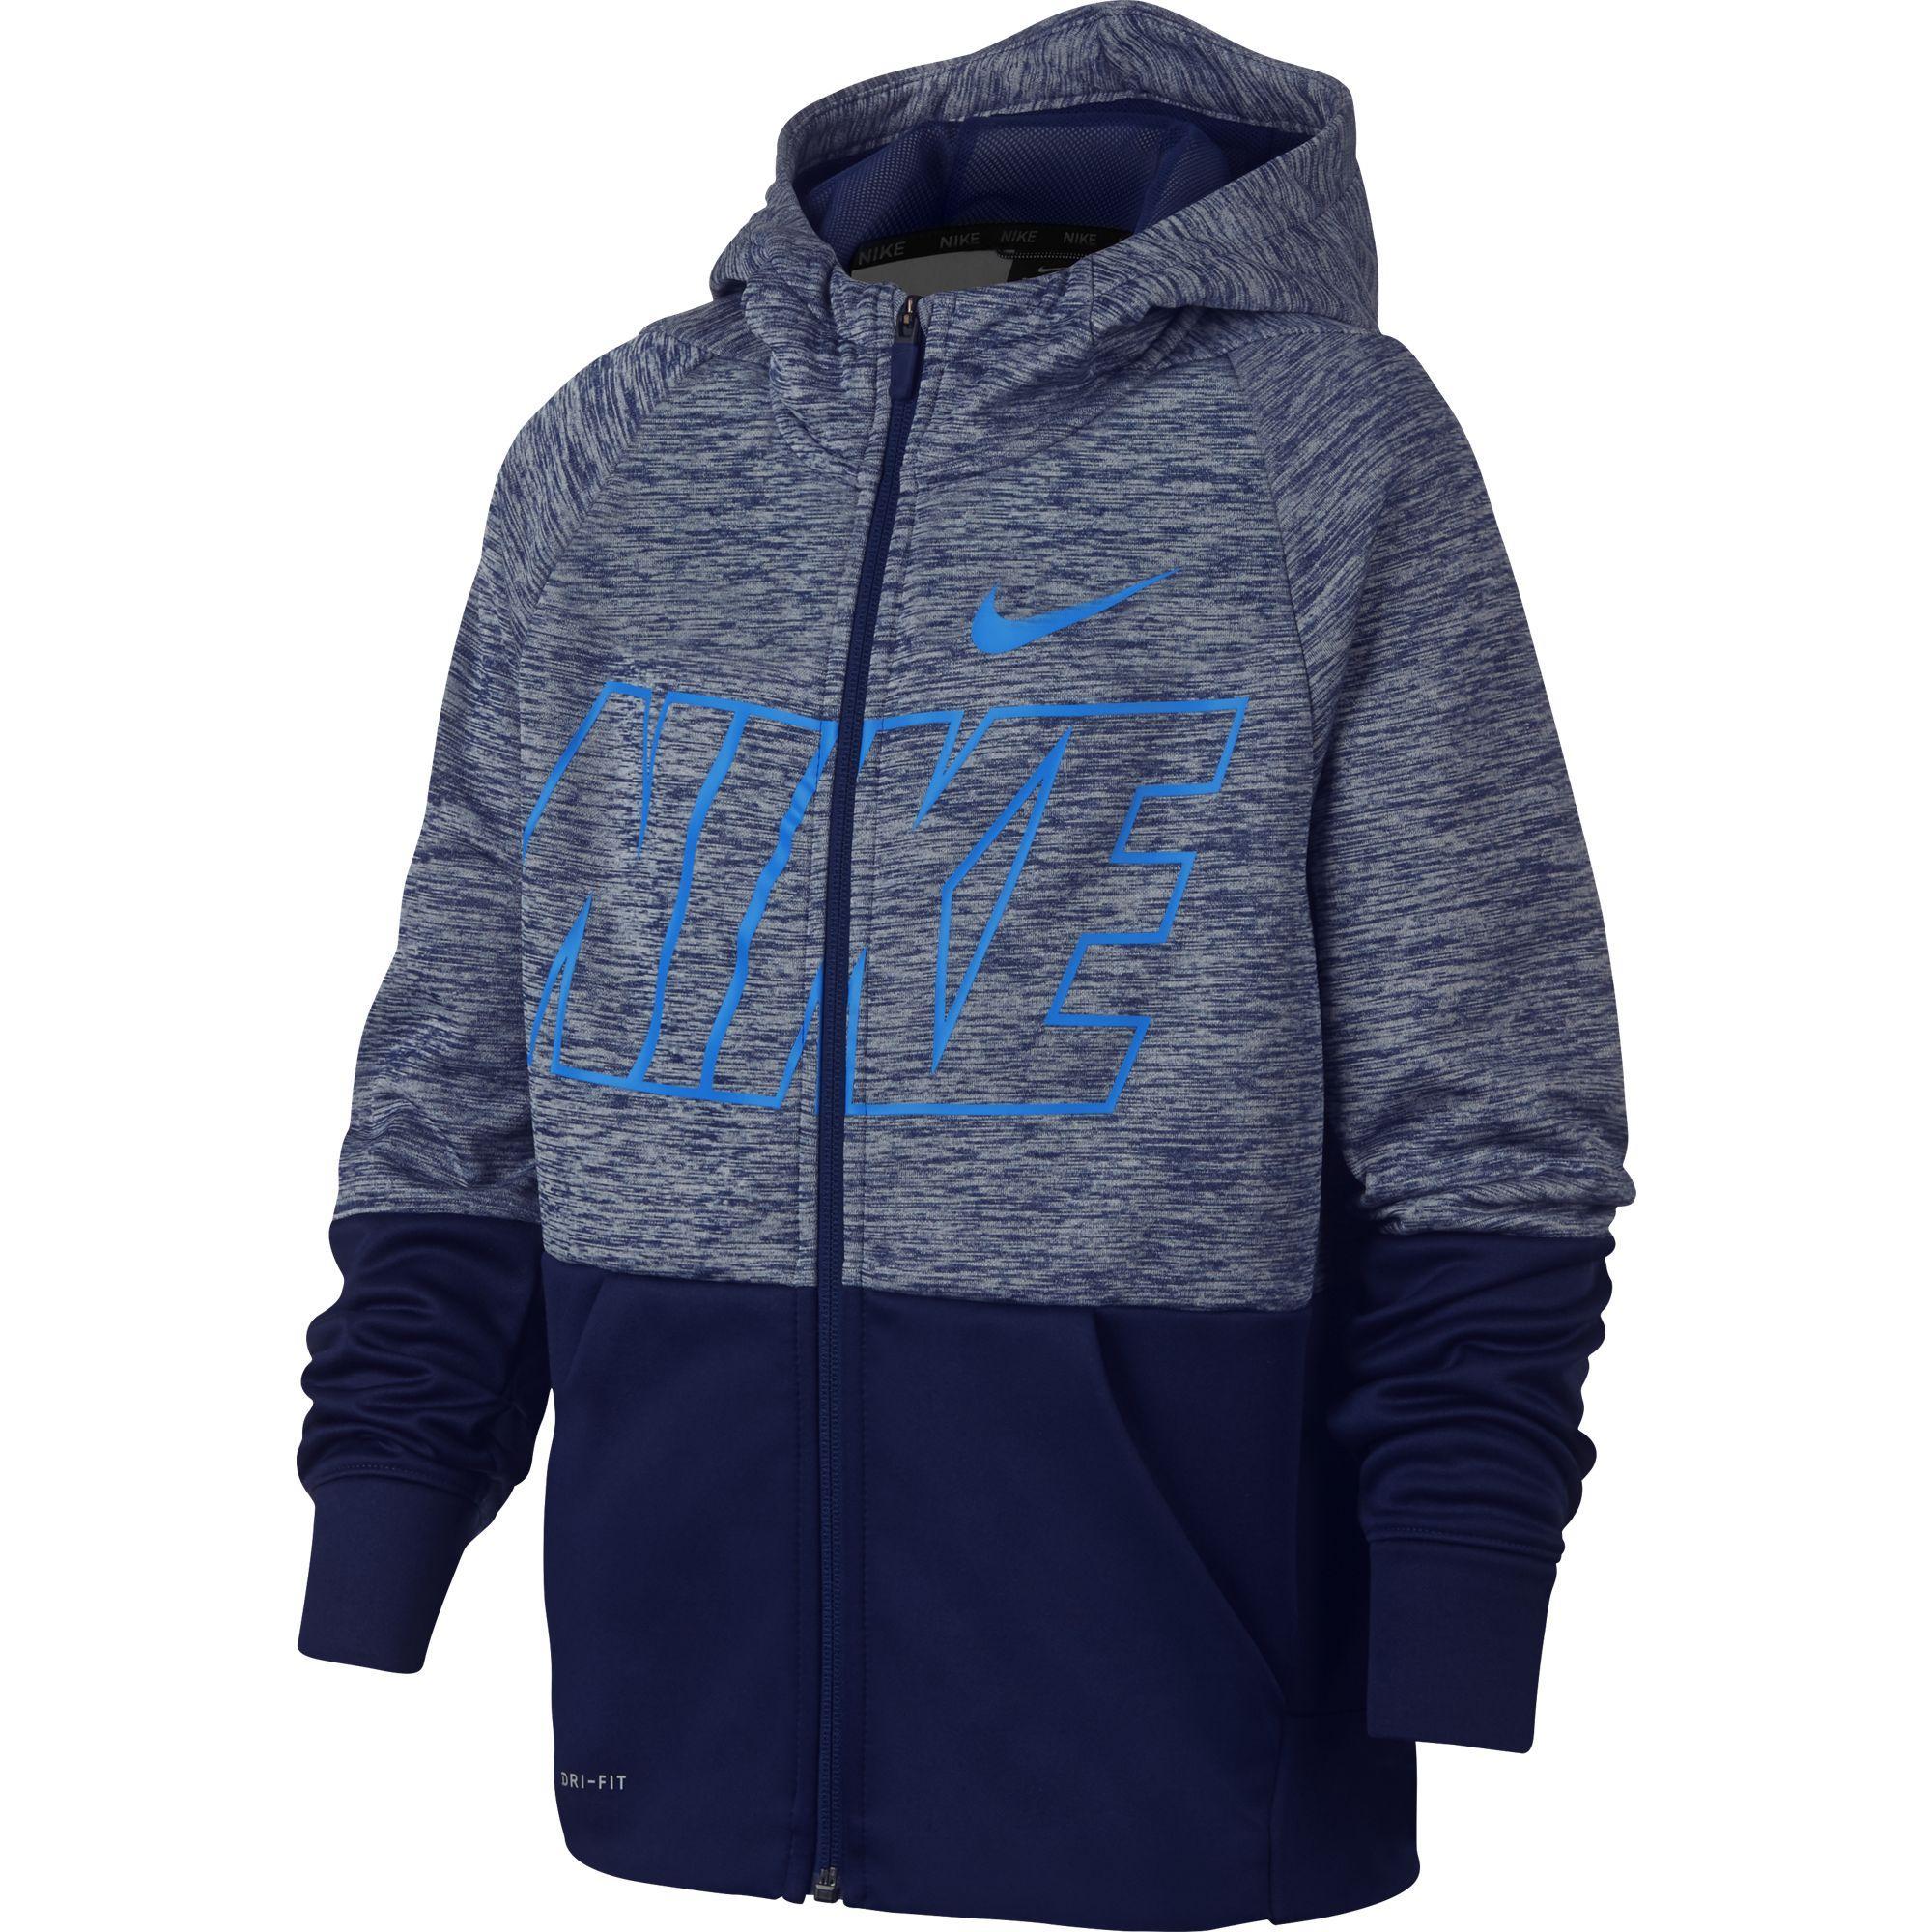 01d19895c Nike Boys Dri-FIT Therma Full-Zip Training Hoodie - Blue Void/Blue Hero -  Tennisnuts.com